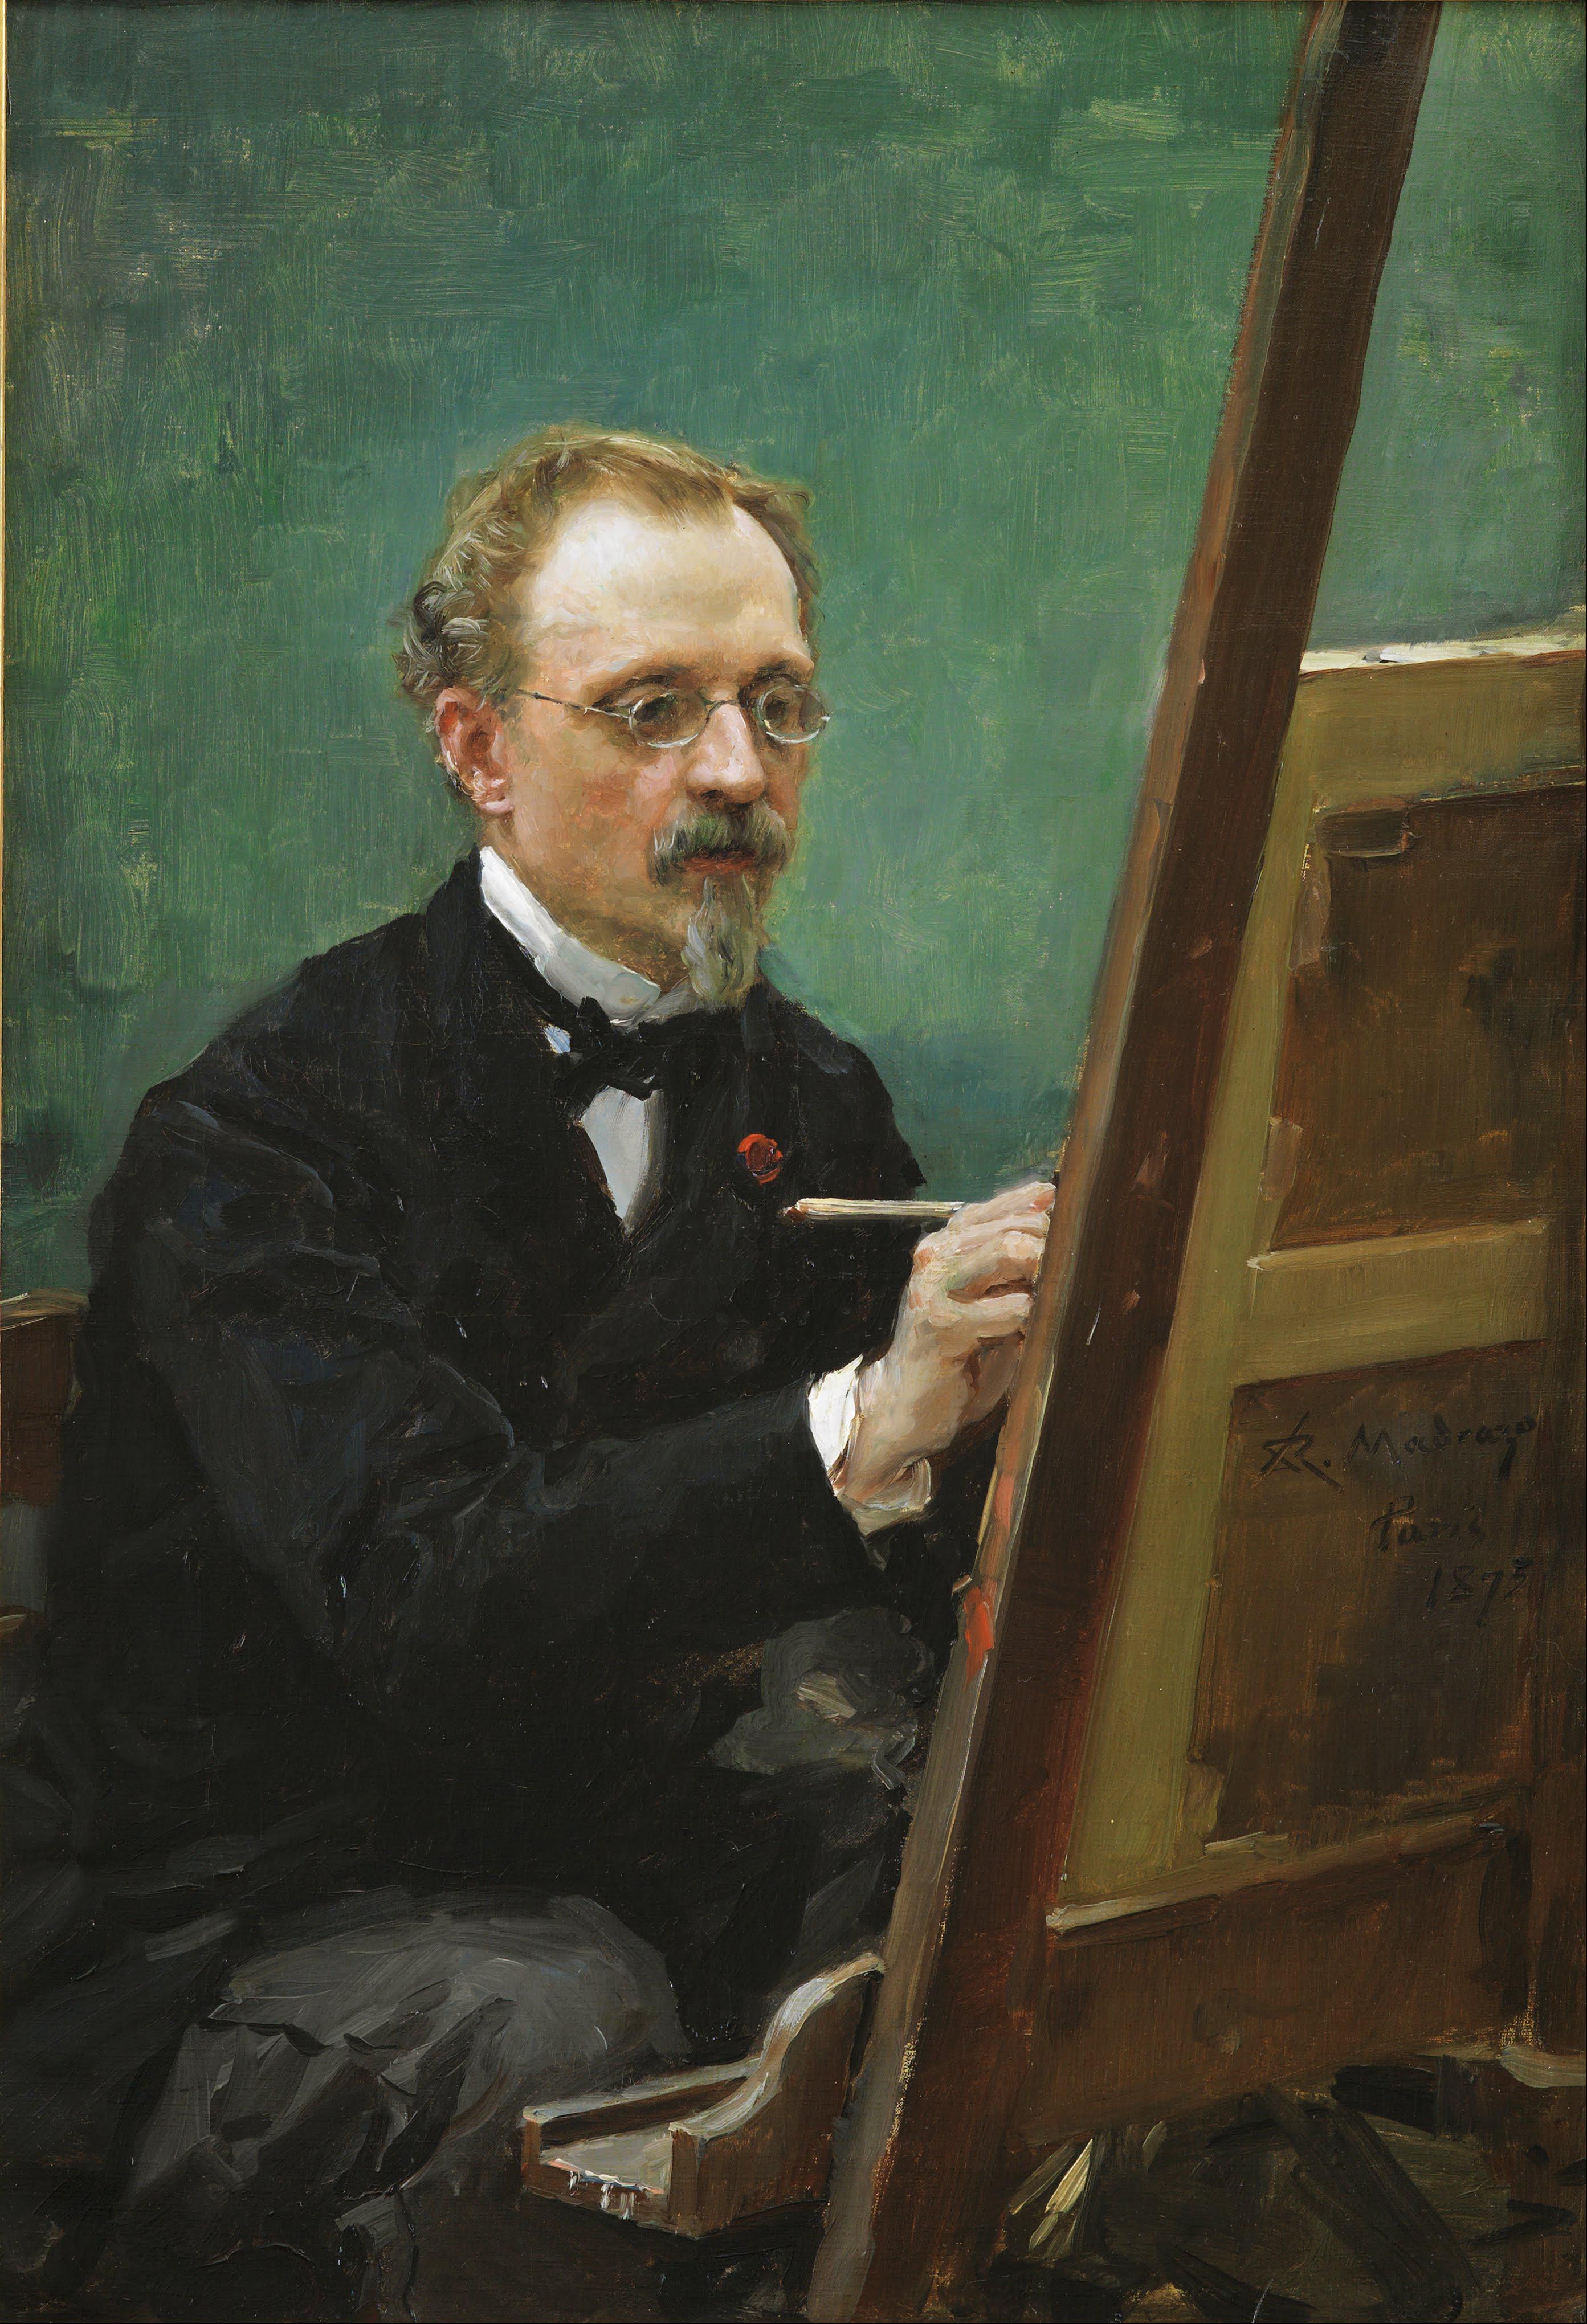 https://upload.wikimedia.org/wikipedia/commons/f/fd/Raimundo_de_Madrazo_-_Portrait_of_Federico_de_Madrazo_Painting_-_Google_Art_Project.jpg